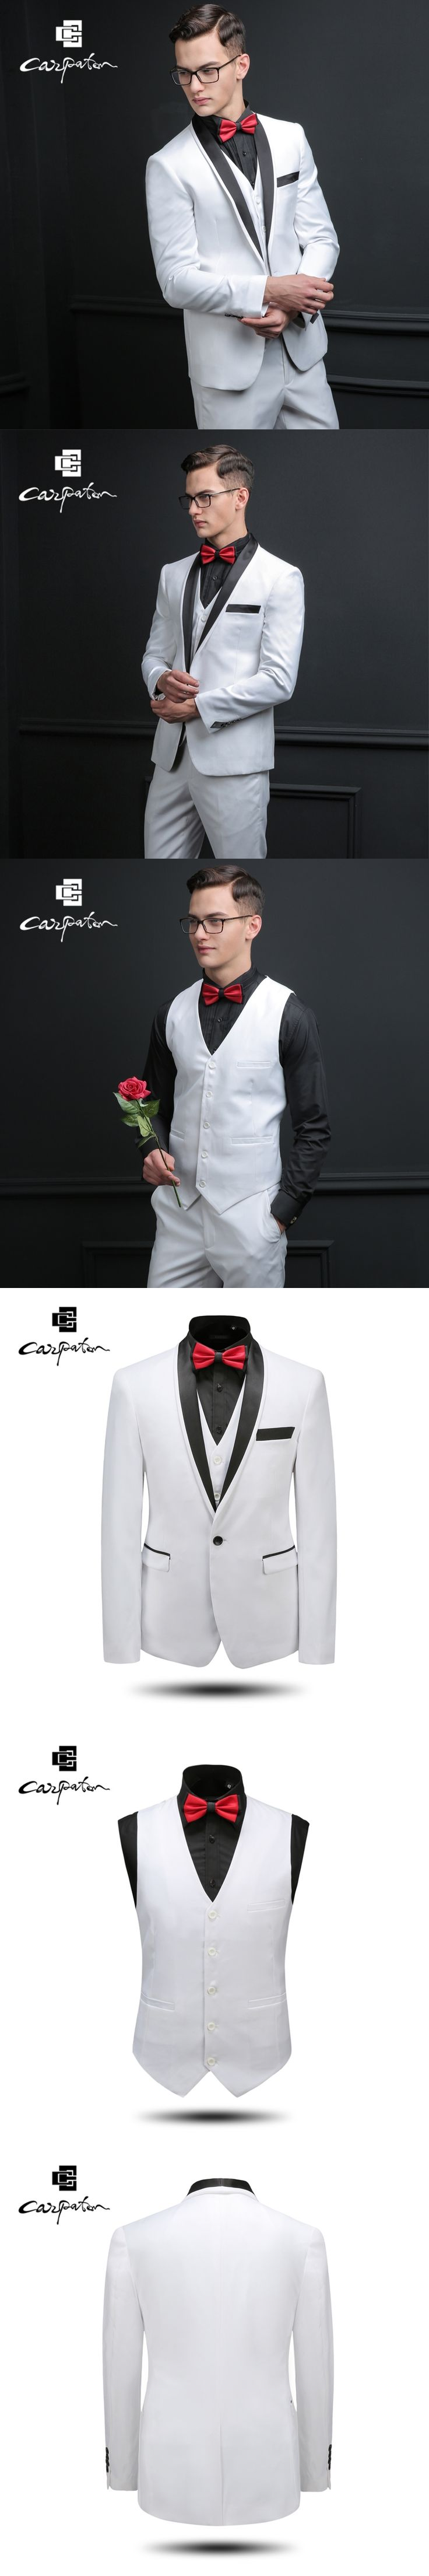 Carpaton Men Suit White Wool Designer Three Piece Suit Brand Shawl Collar Tuxedo Large Size Grooms Wedding Suits For Men